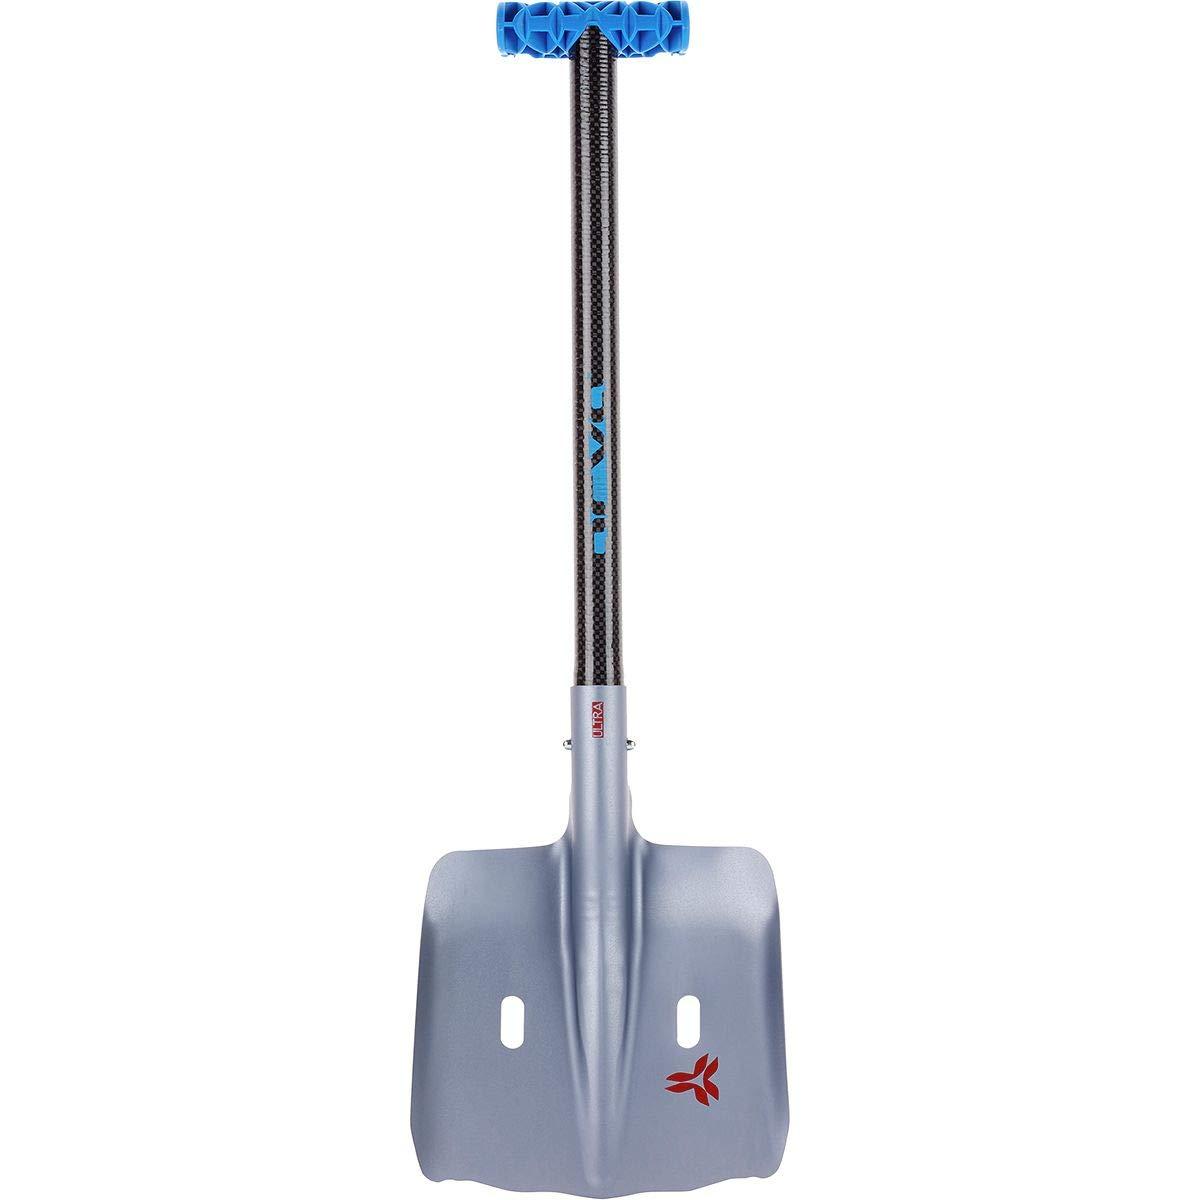 Arvaアルバ ULTRA Shovel ウルトラ ショベル AR112   B07J3RCDWM